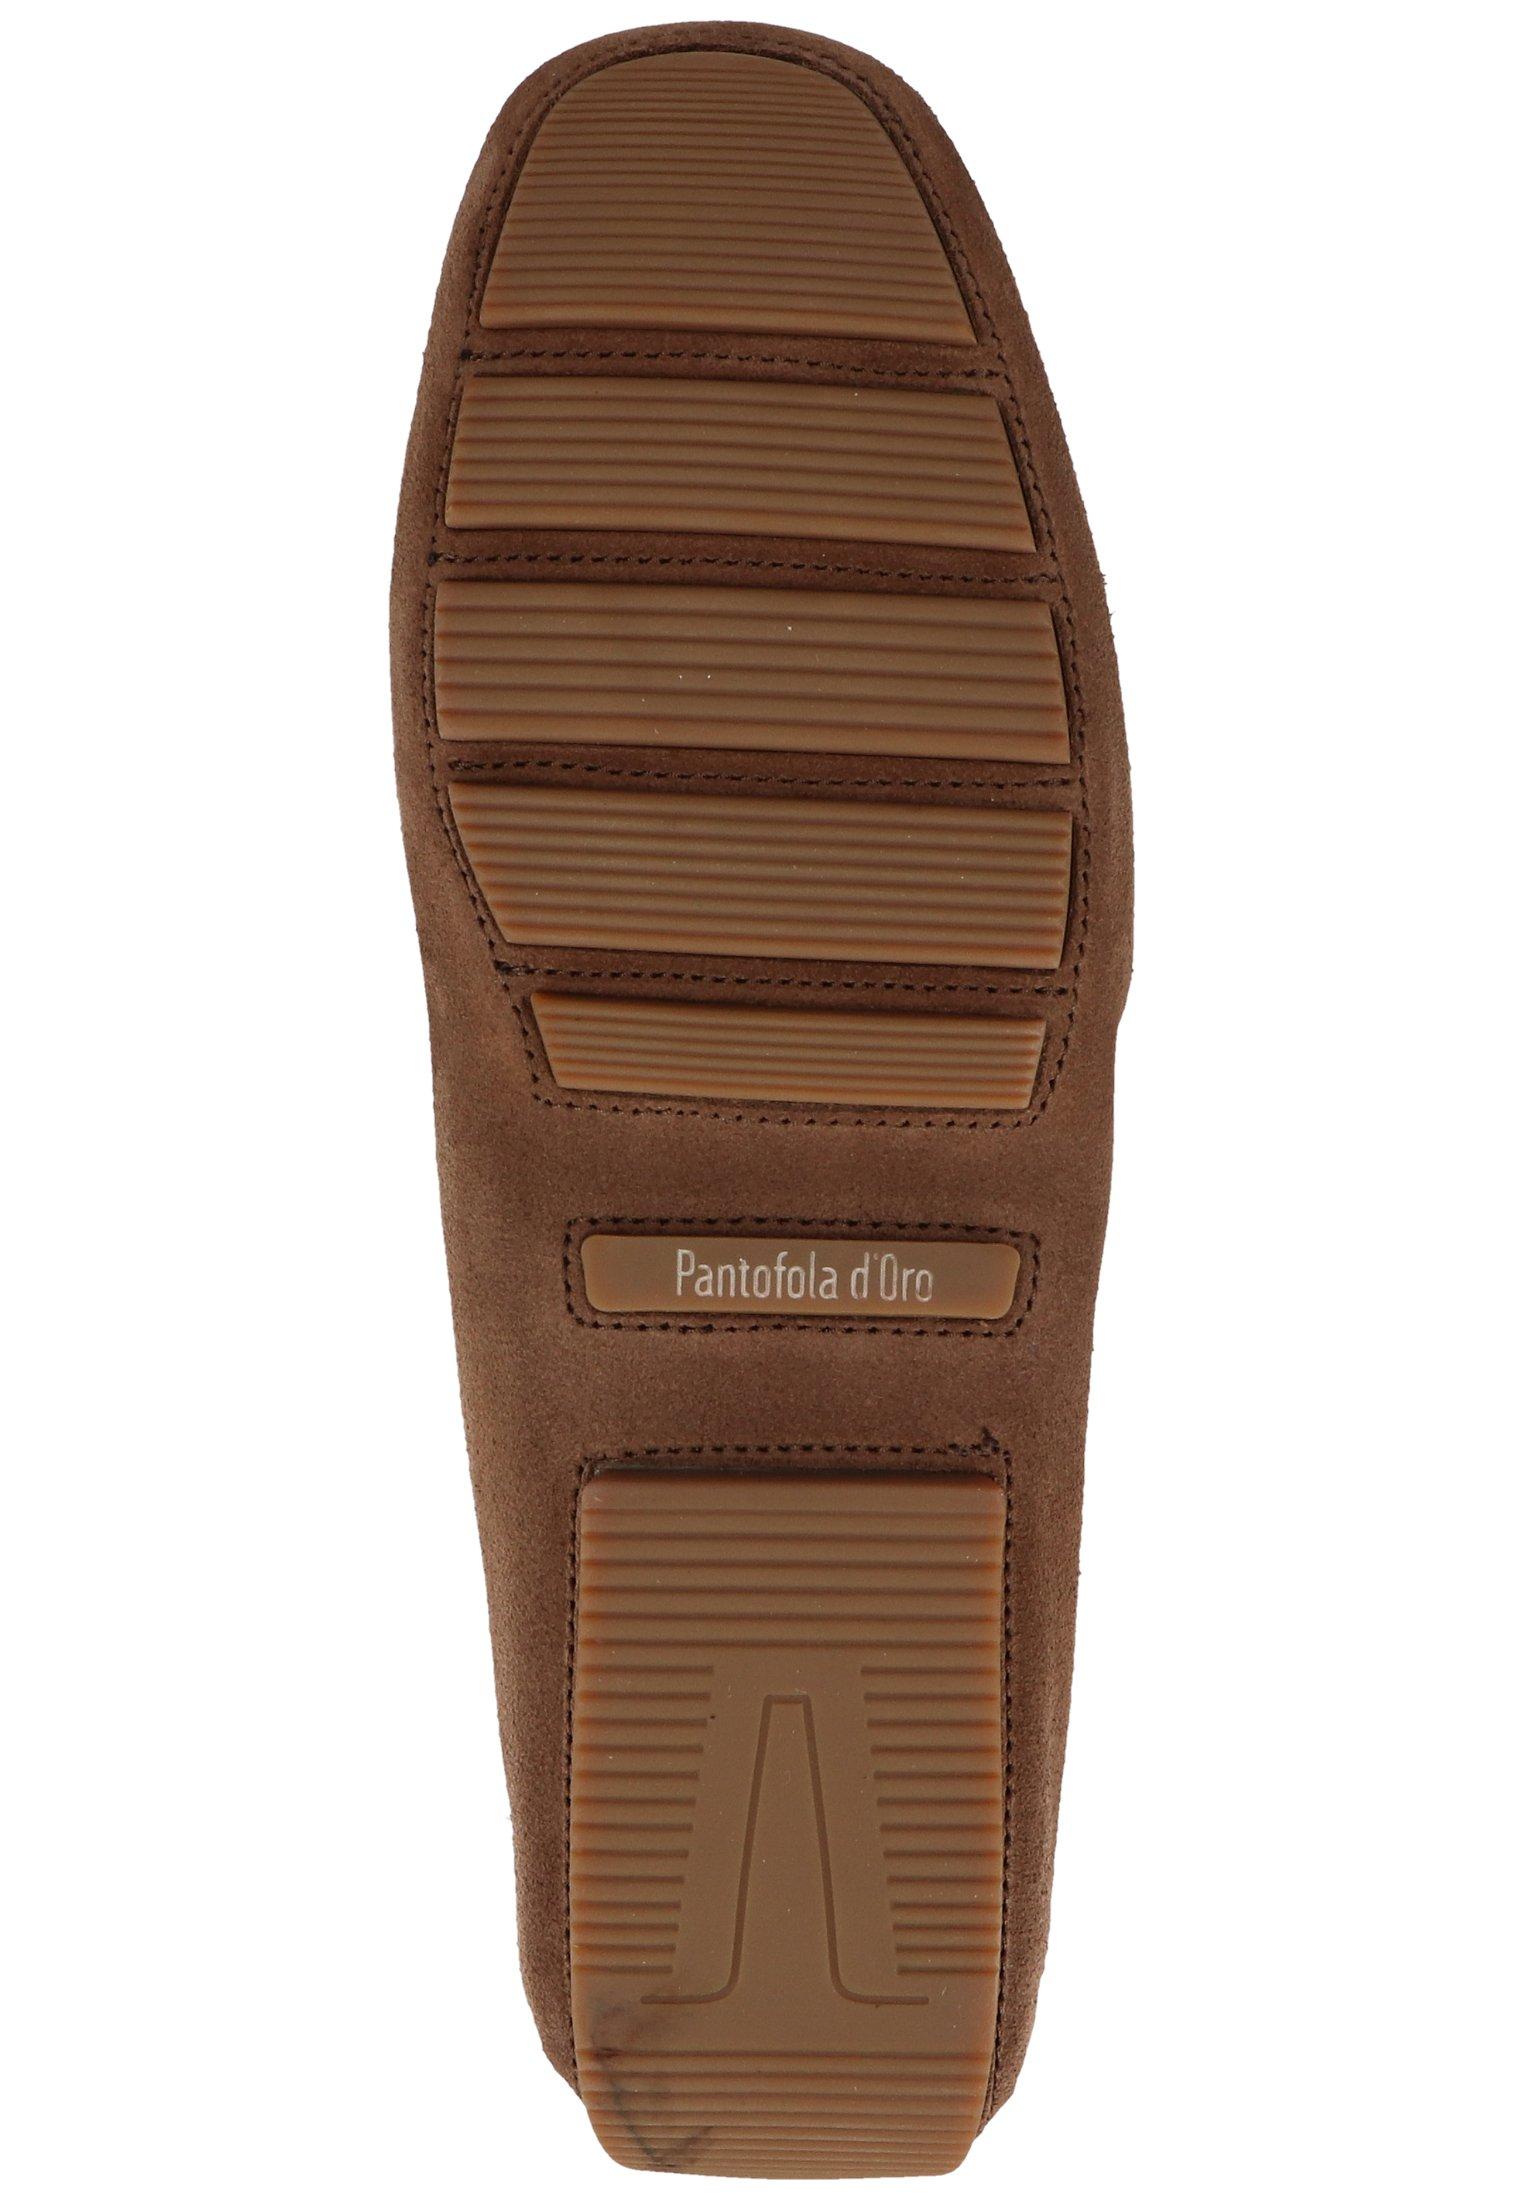 Pantofola d'Oro Mocassins - taupe grey